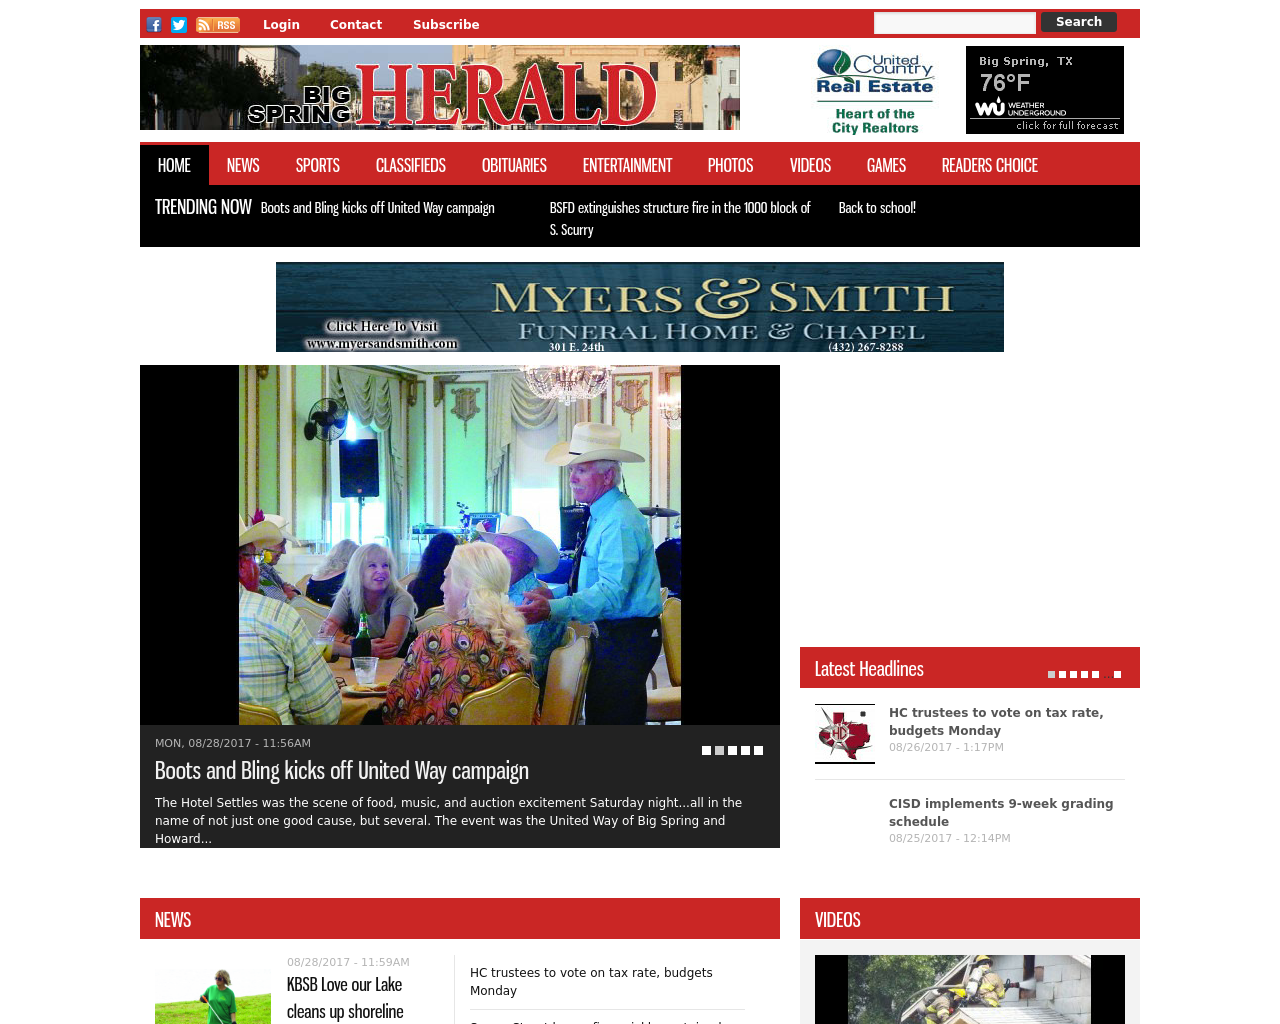 Big-Spring-Herald-Advertising-Reviews-Pricing